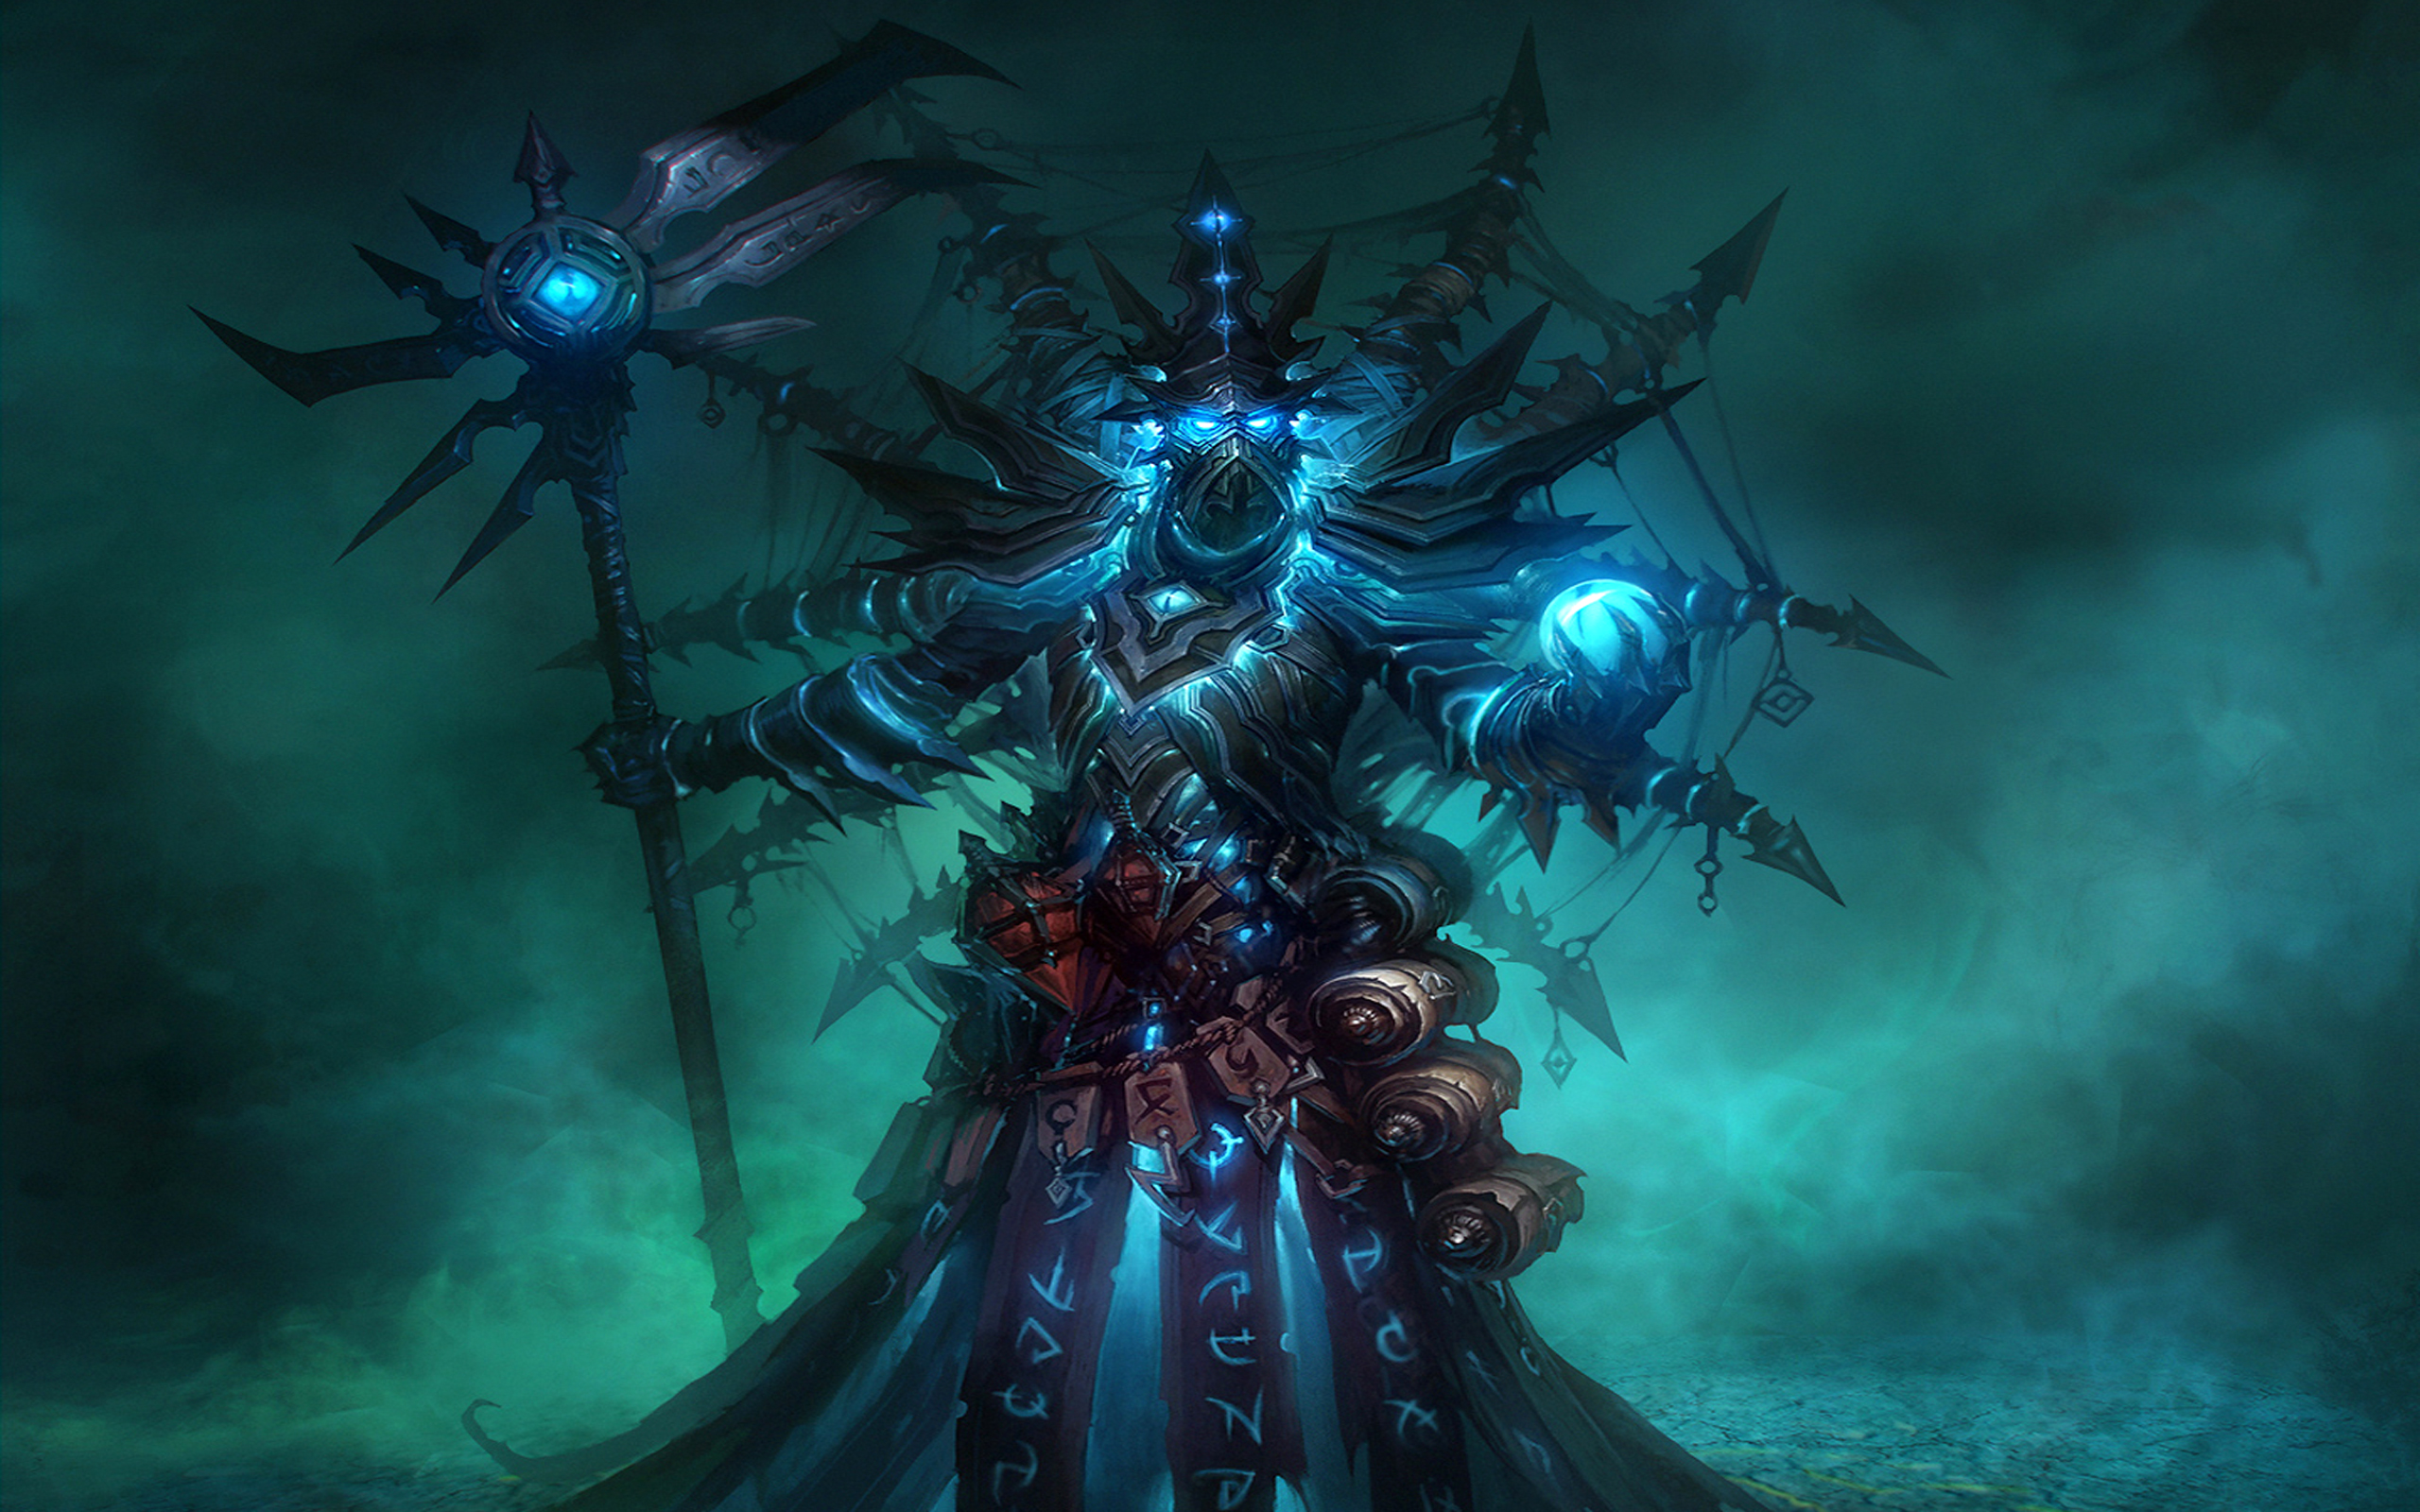 Jeux Vidéo - Warhammer  Ringwraith Fond d'écran